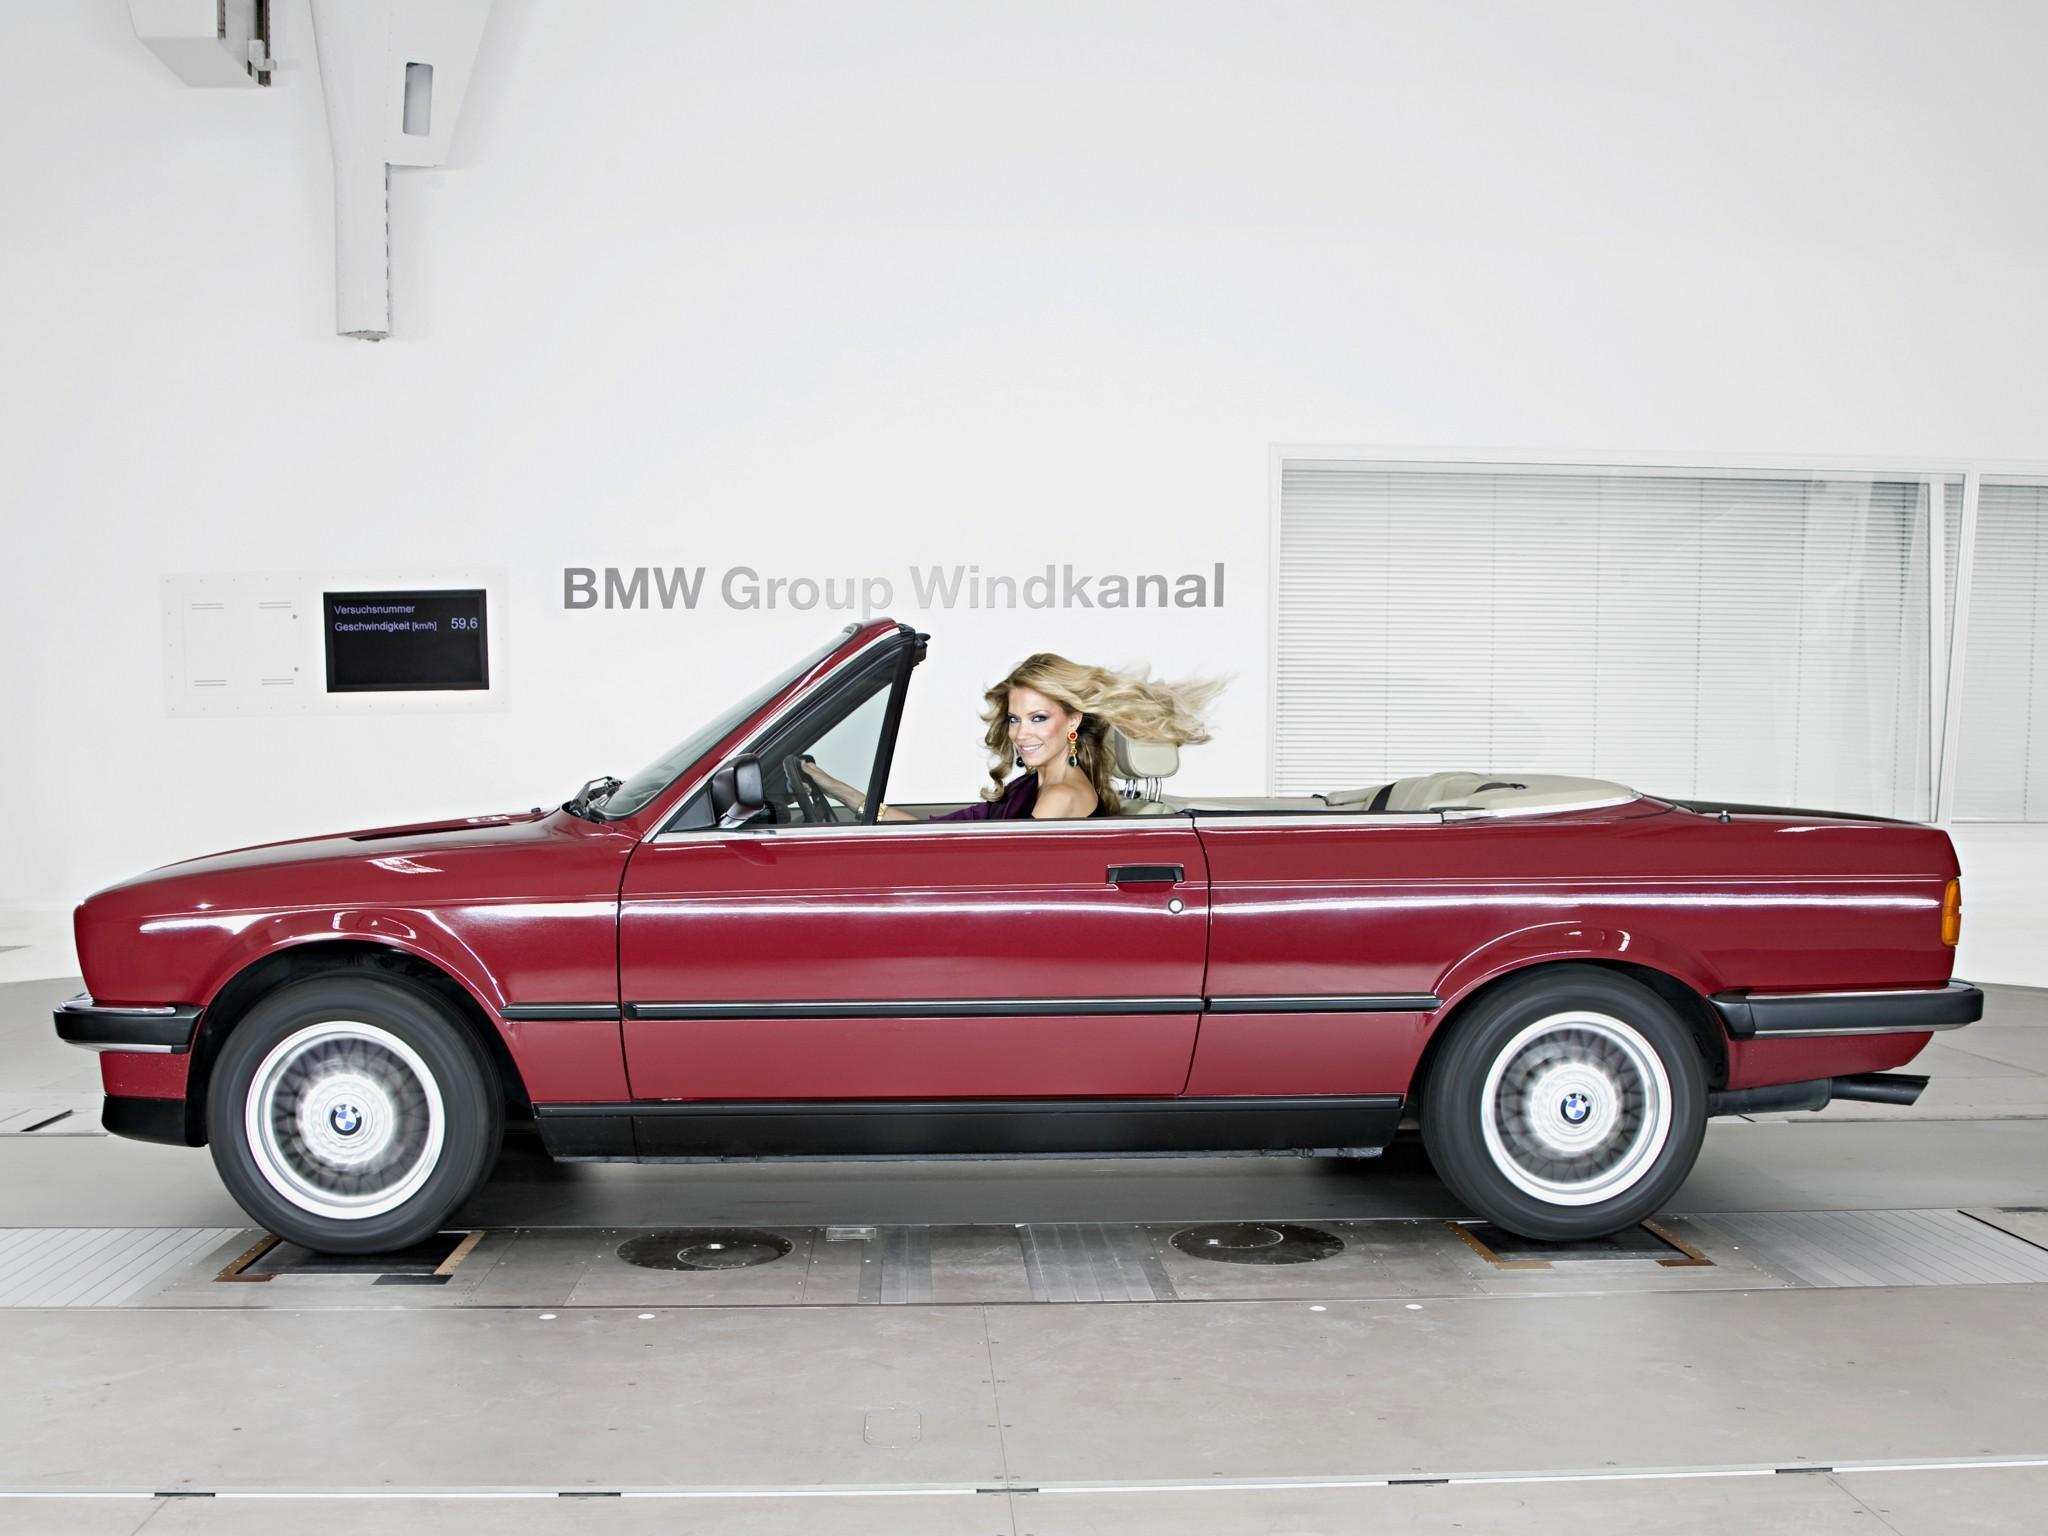 bmw 3 series cabriolet e30 specs 1986 1987 1988 1989 1990 1991 1992 1993 autoevolution. Black Bedroom Furniture Sets. Home Design Ideas